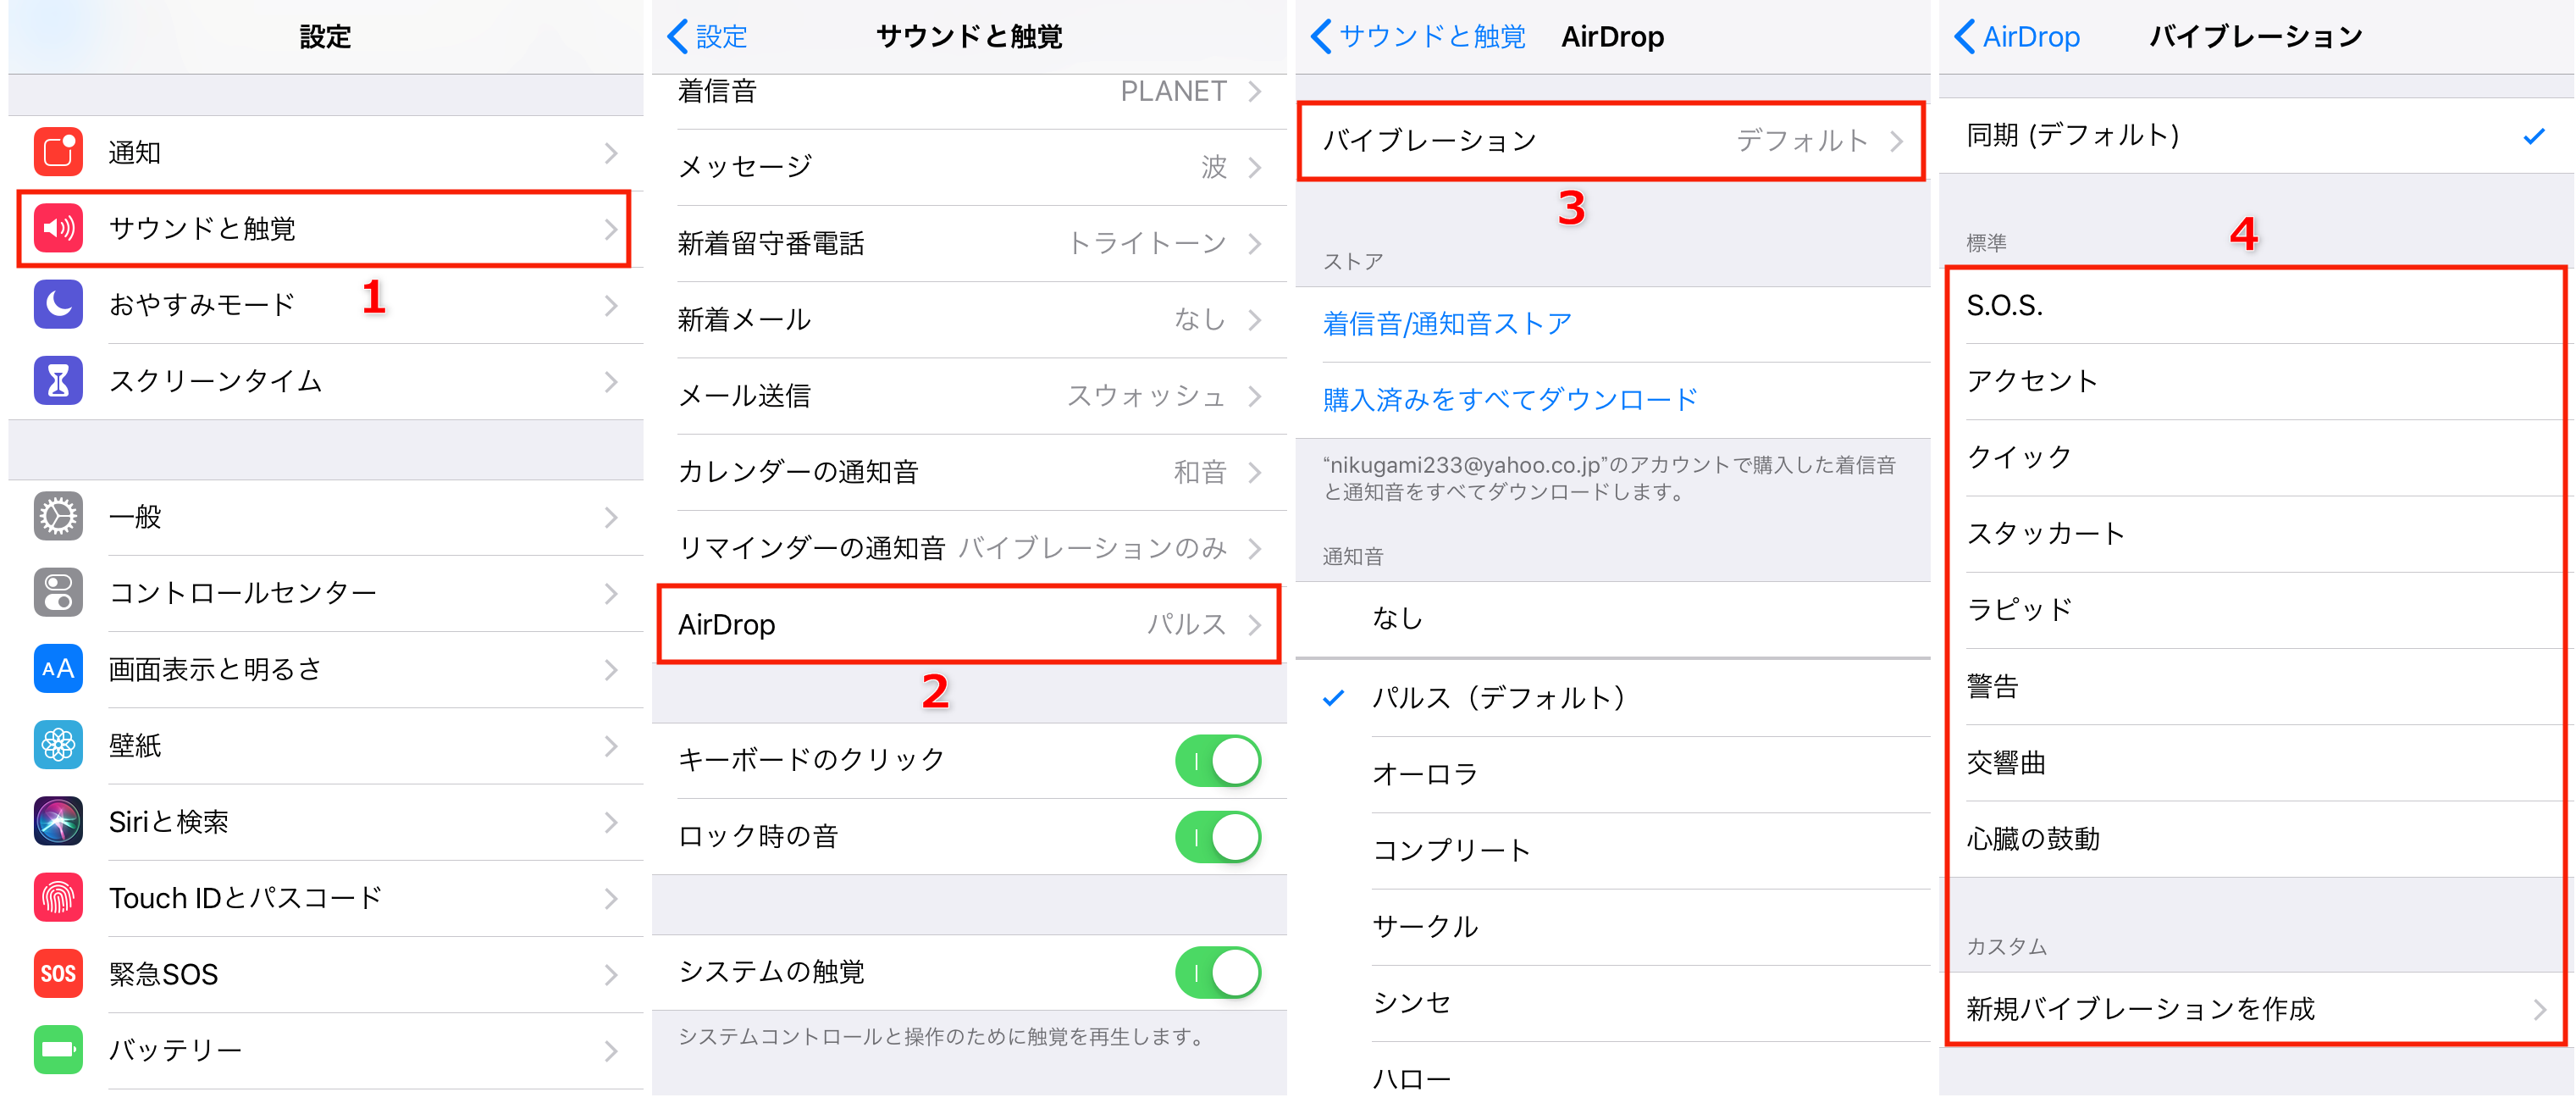 【iOS 12/11】iPhoneでAirDropの使い方と設定 パート4